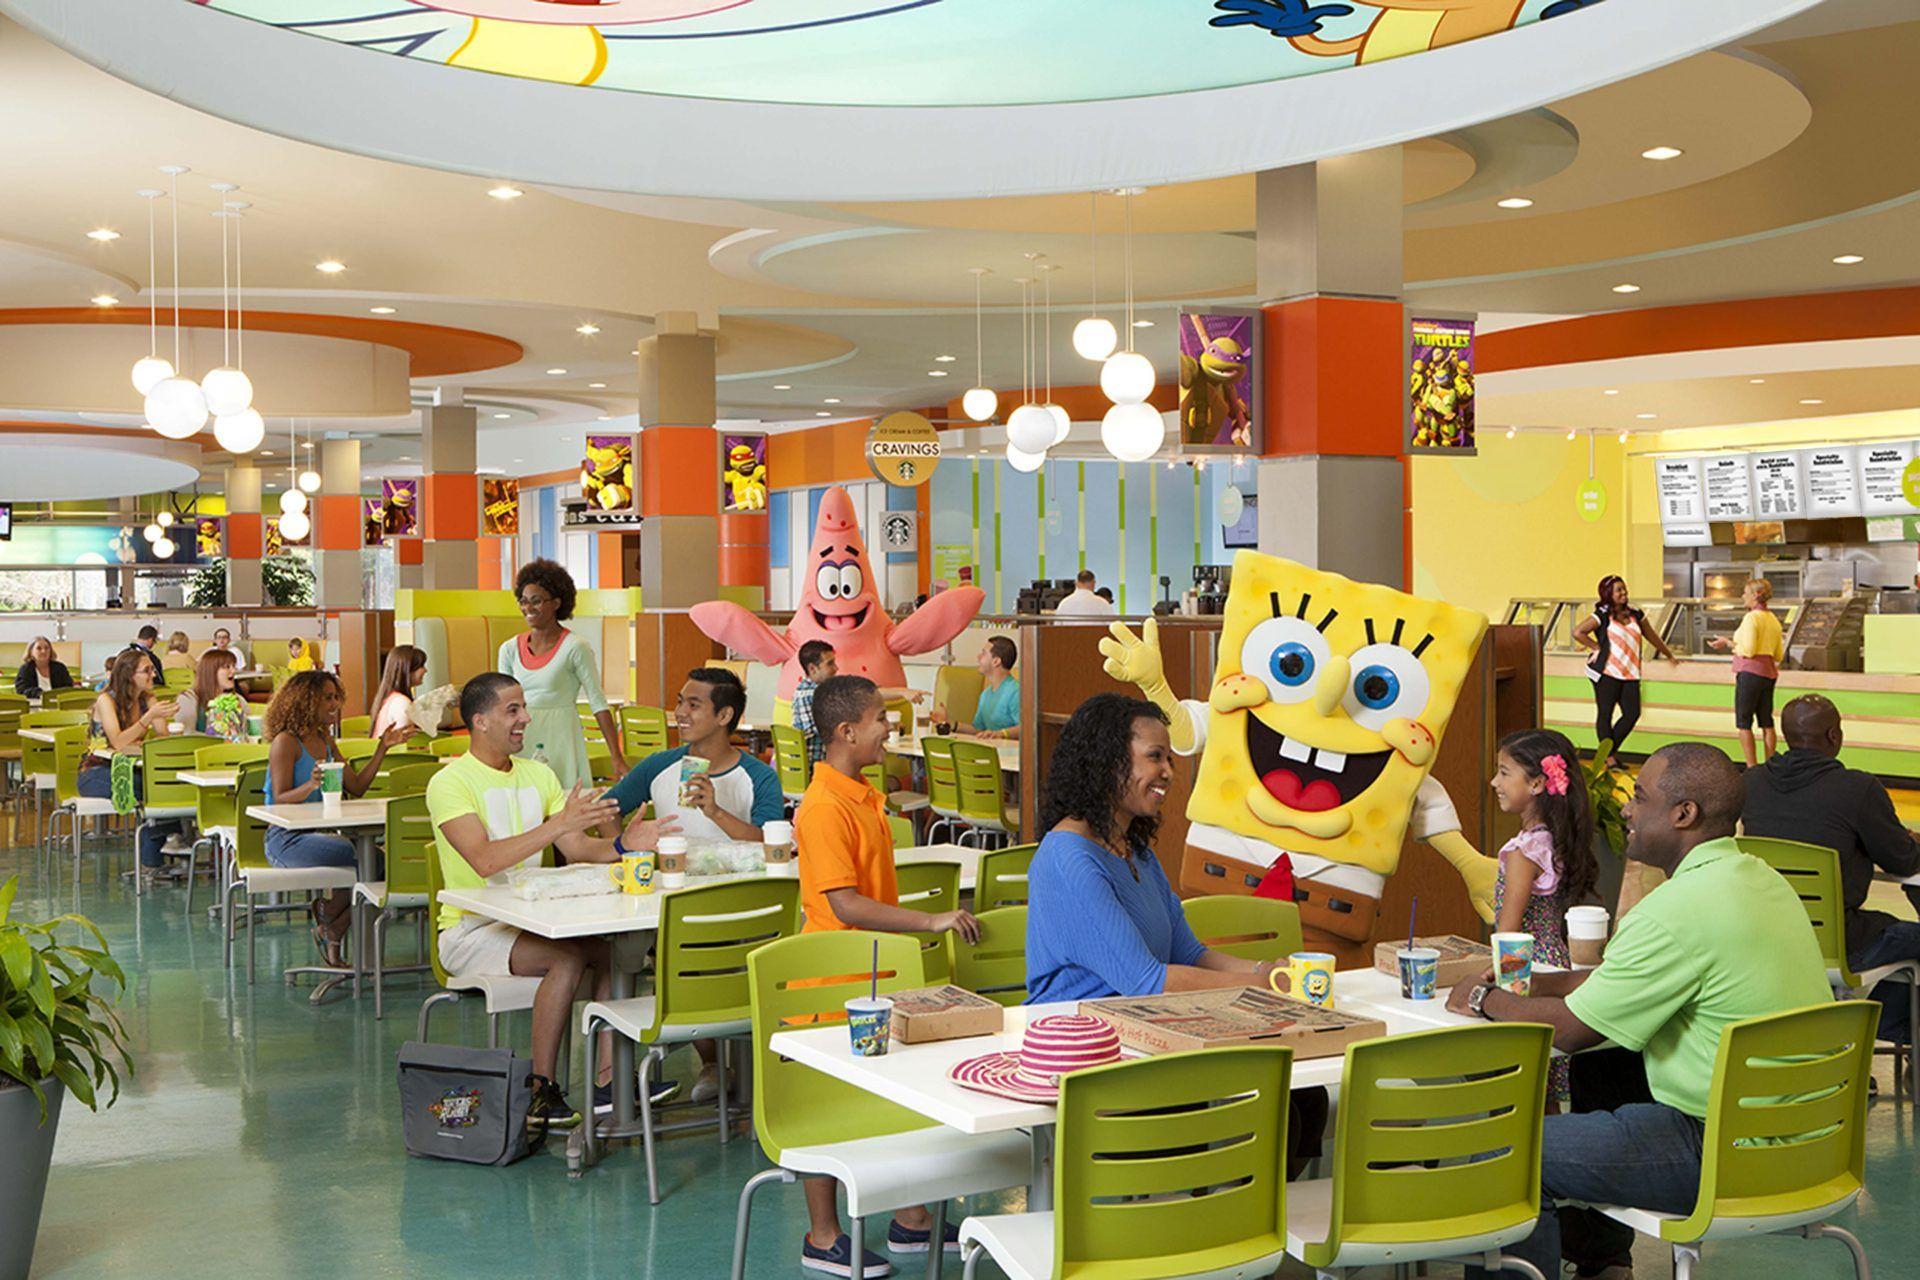 Classic Nickelodeon Cartoons Are Coming Back Nickelodeon Hotel Hotels For Kids Orlando Resorts